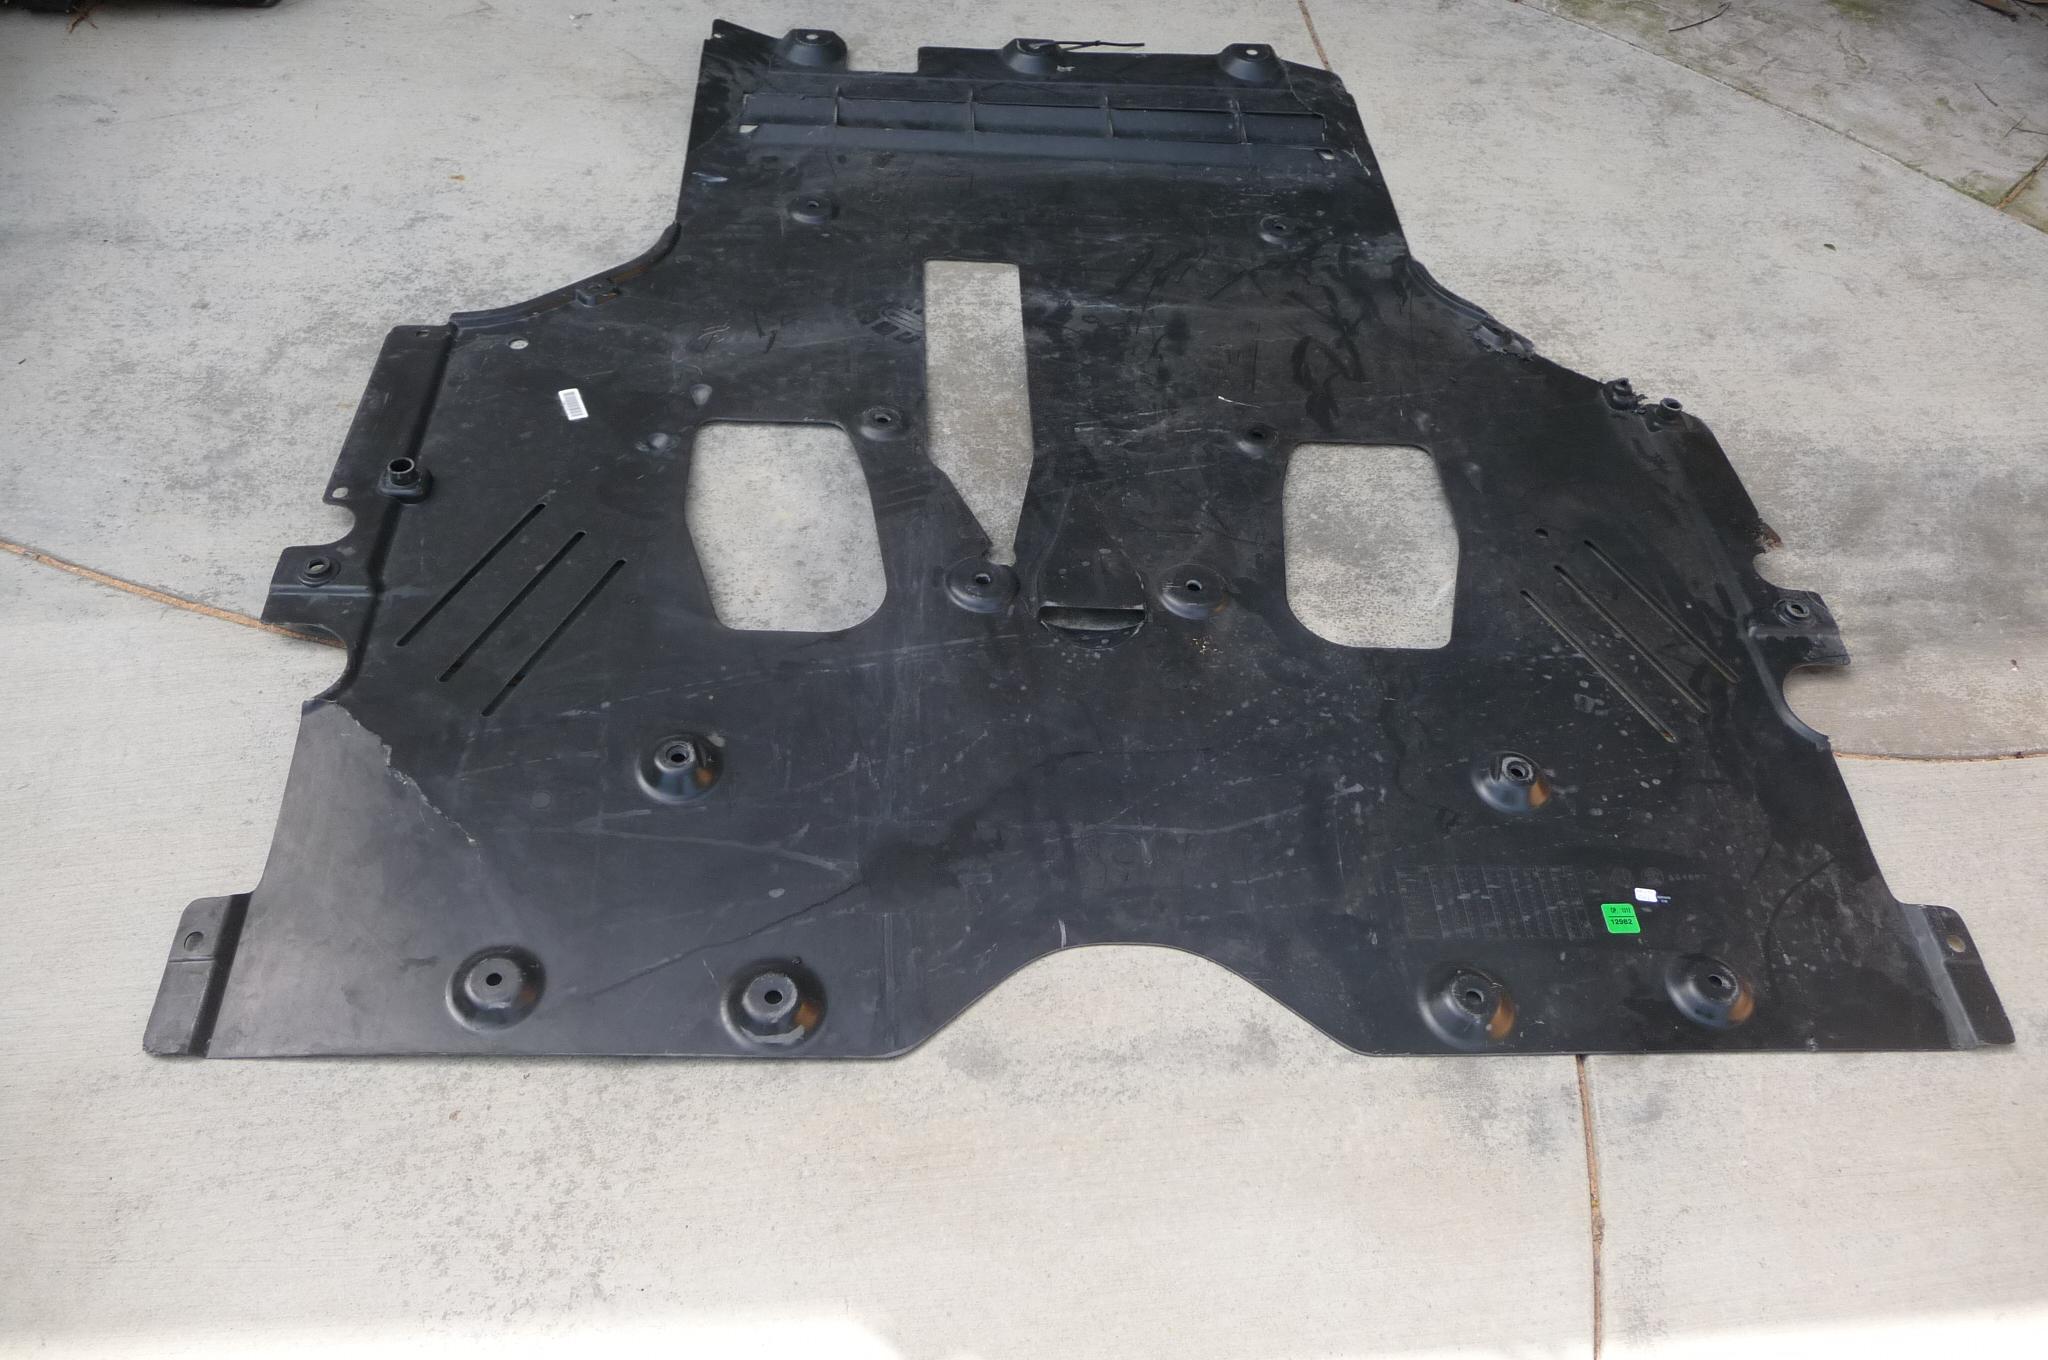 Ferrari F12 Berlinetta Complete Shield Cover for rear part 83360900 OEM OE